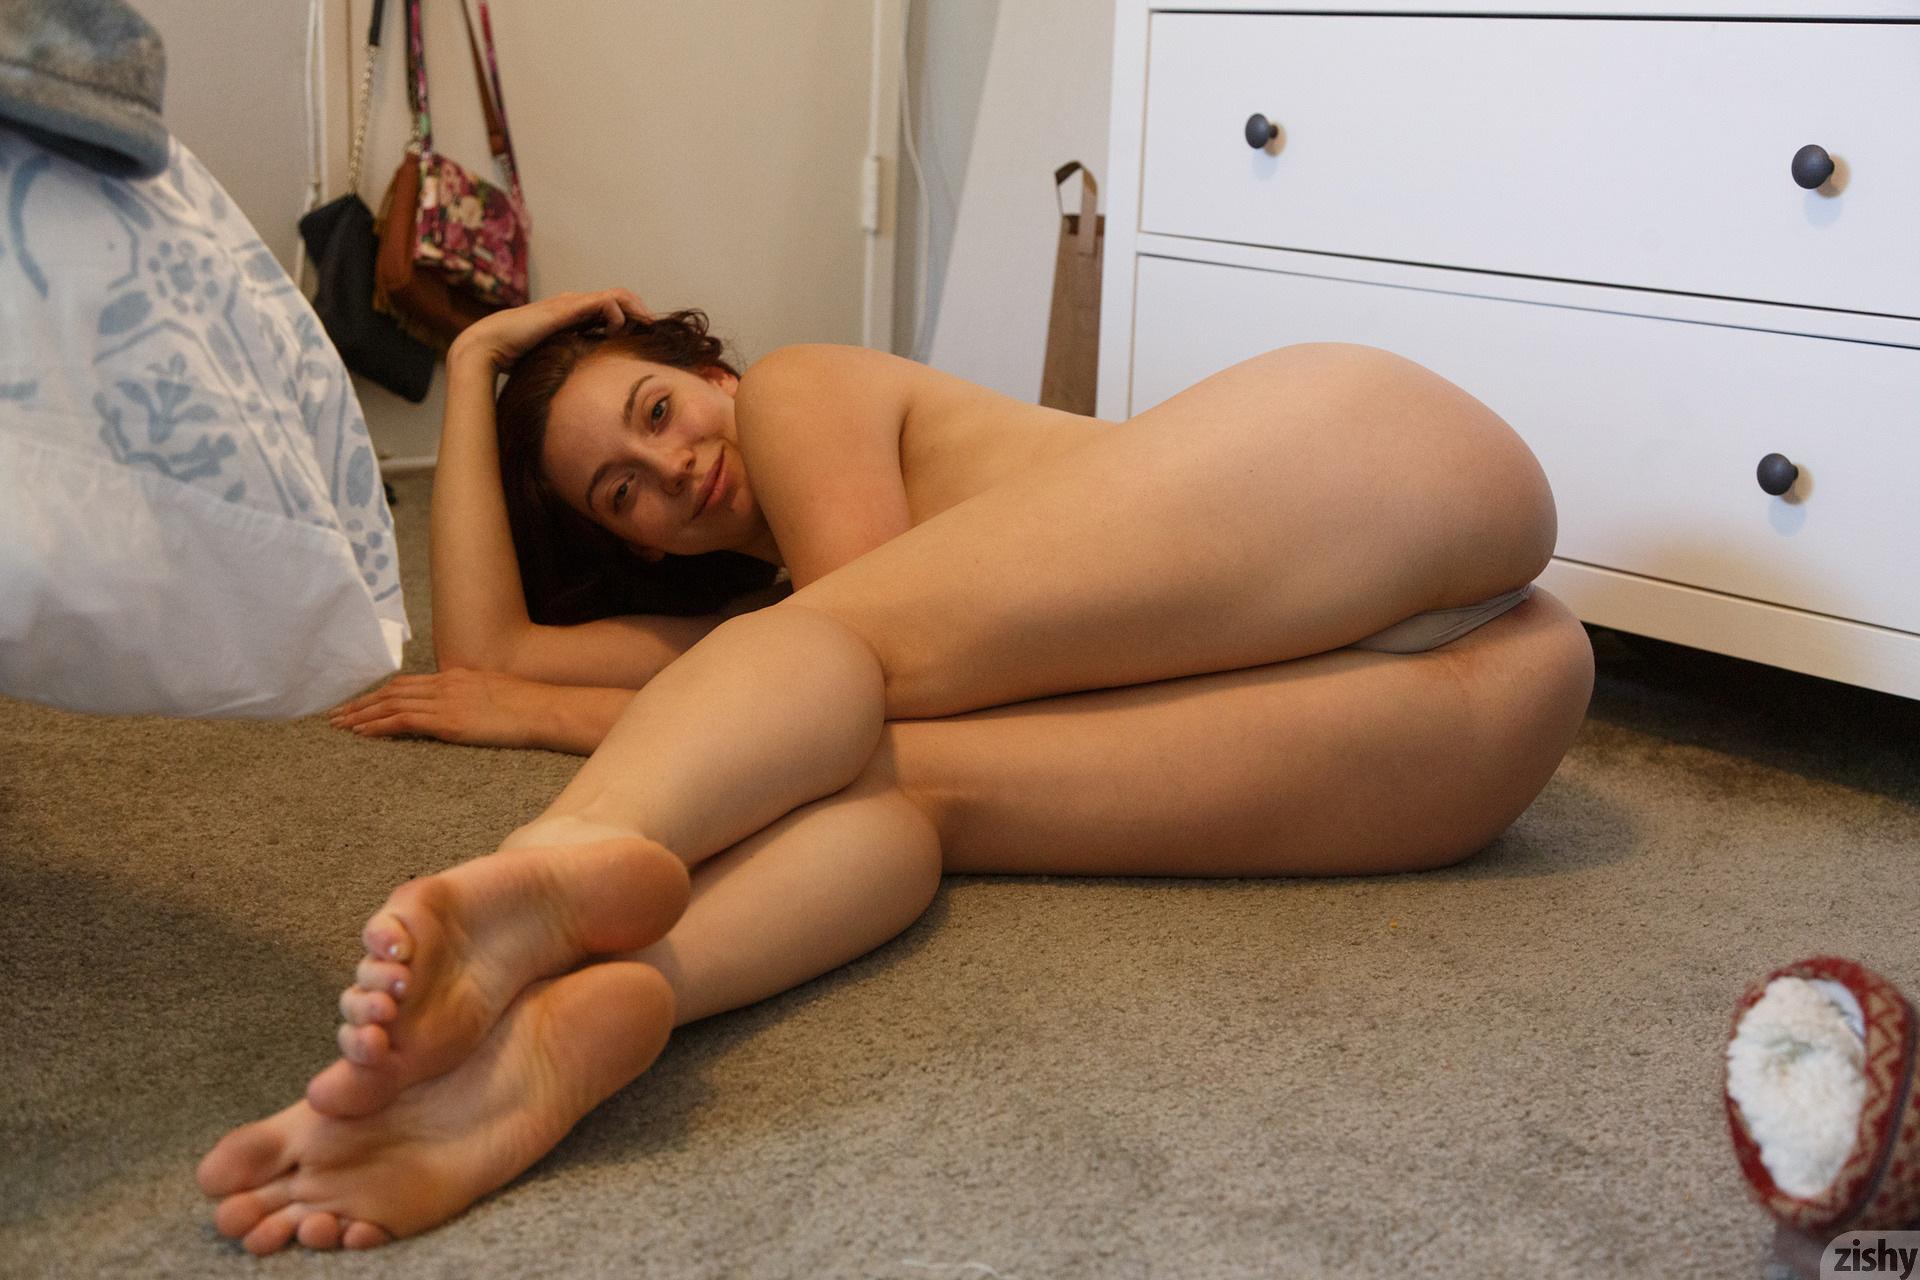 Ivah Anseline Hard But Soft Zishy (45)